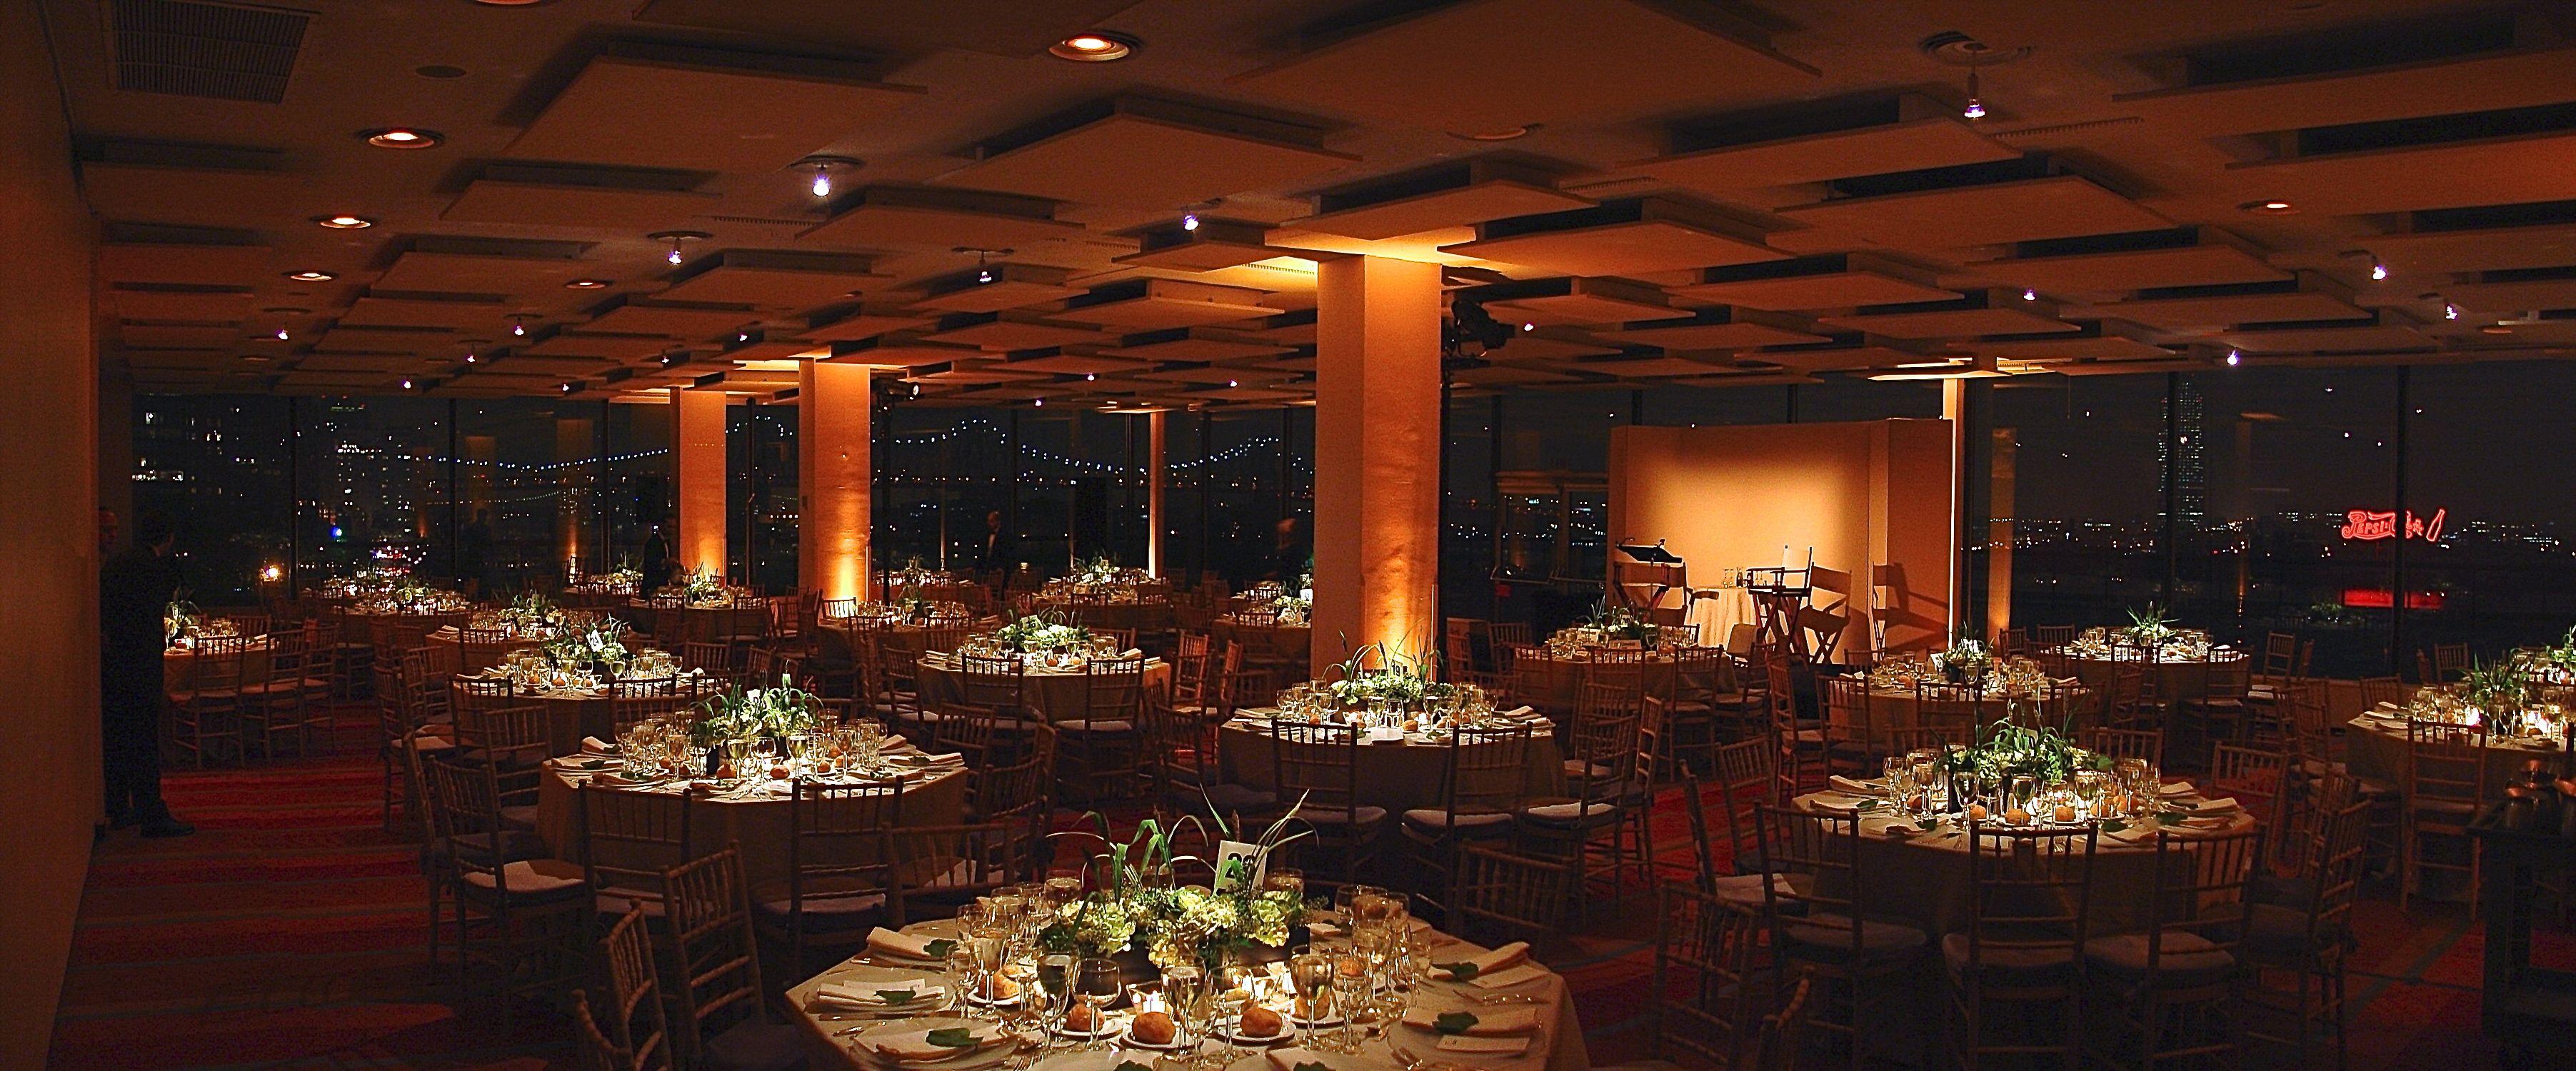 Un Delegates Dining Room Reservations